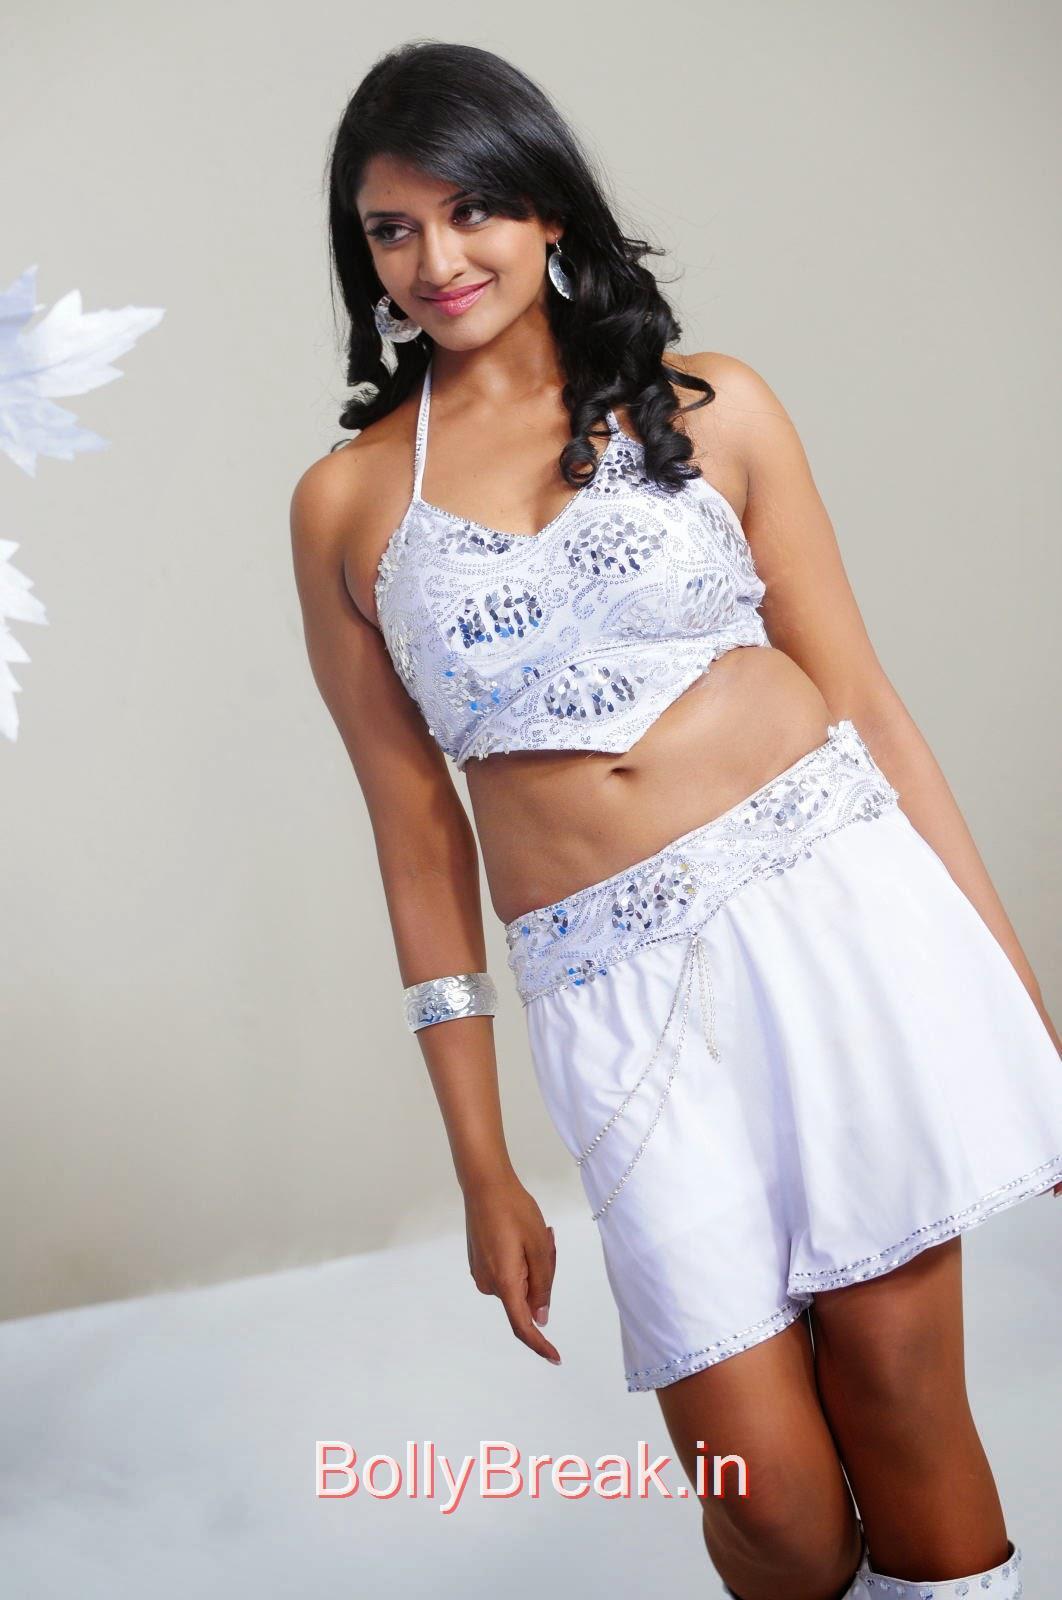 vimala raman hot navel show, Vimala Raman Hot HD Images In White Dress